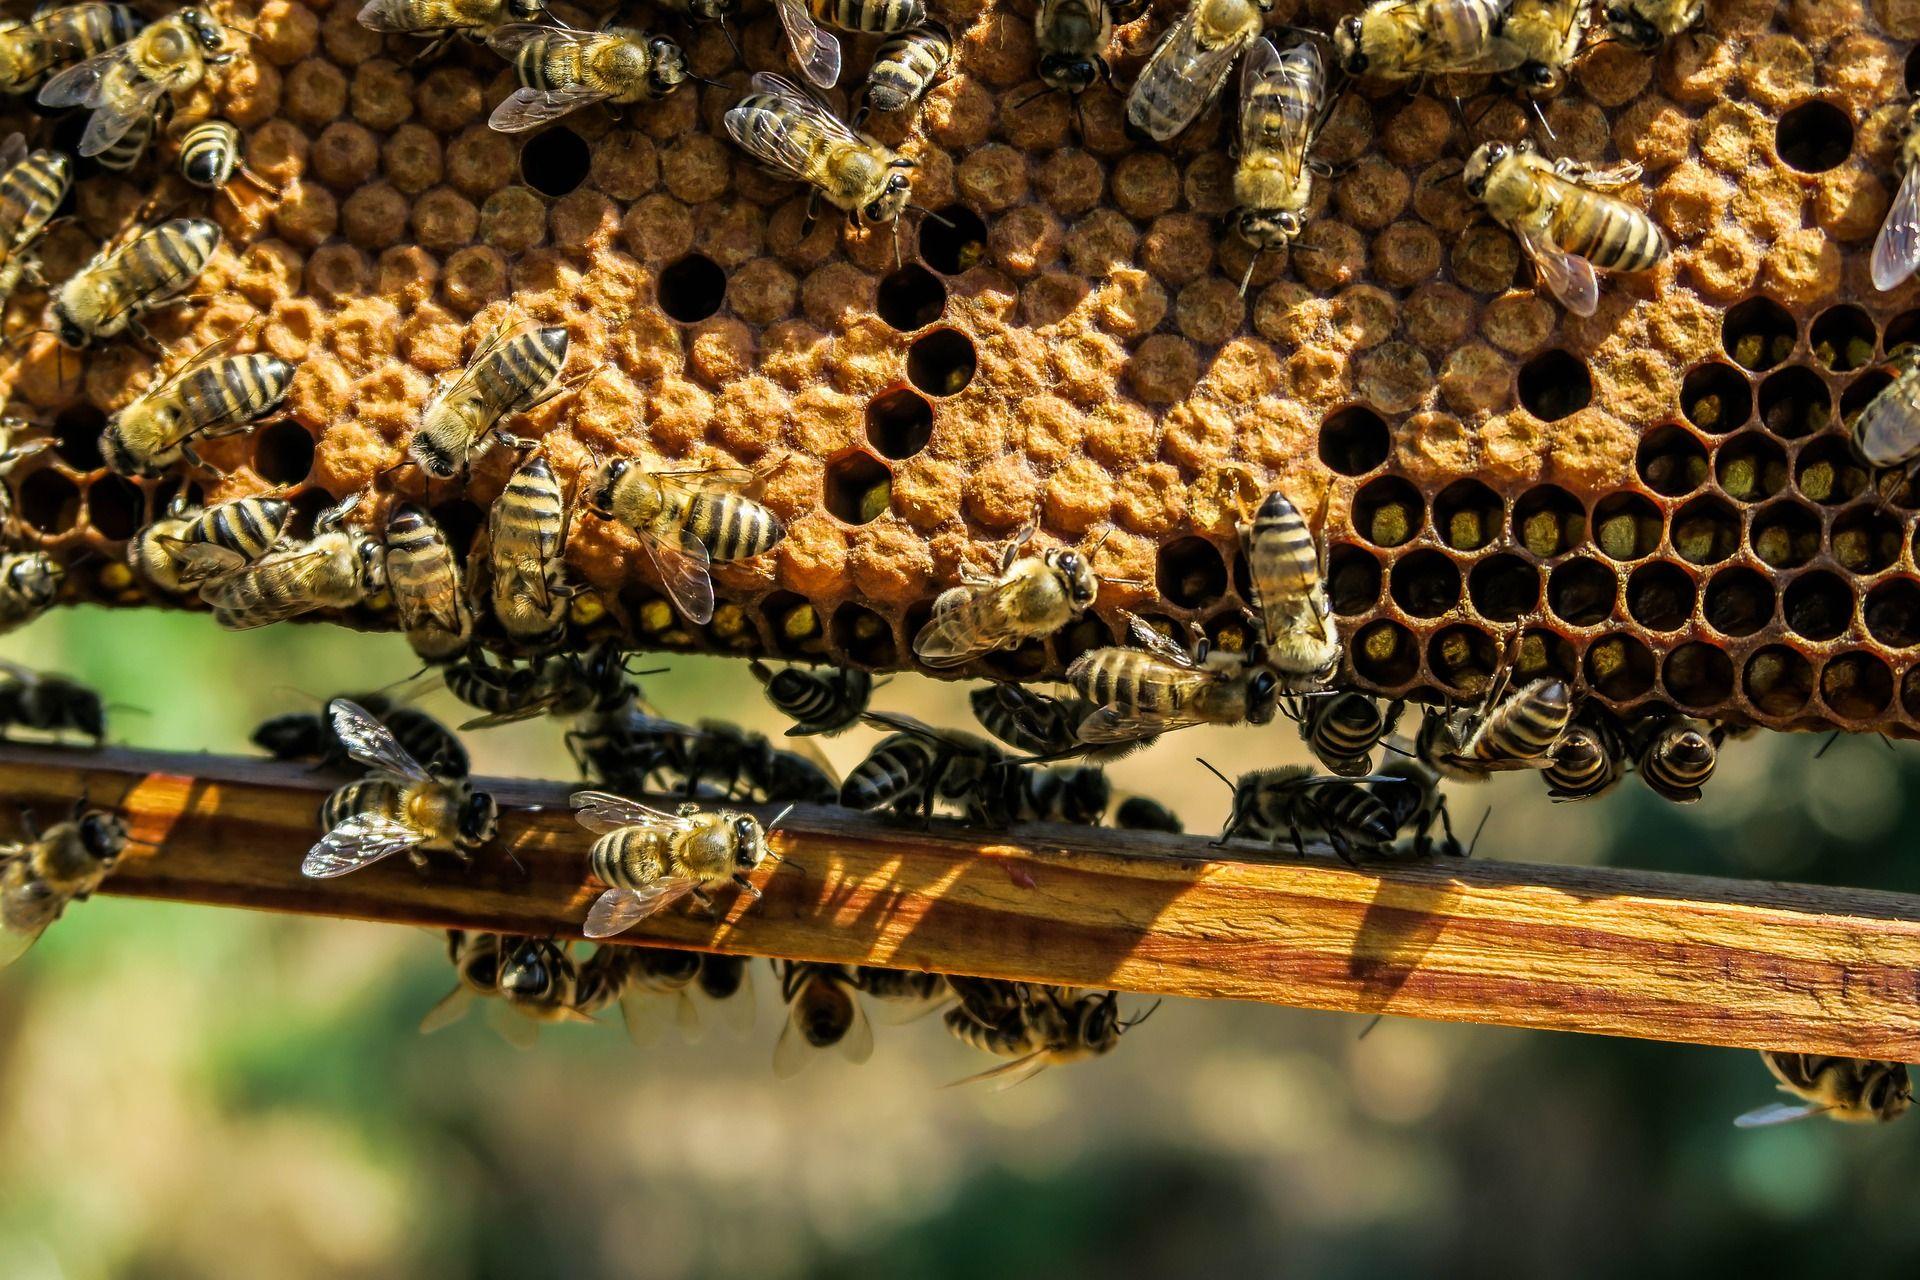 Reine abeille datant datant Epiphone Sheraton